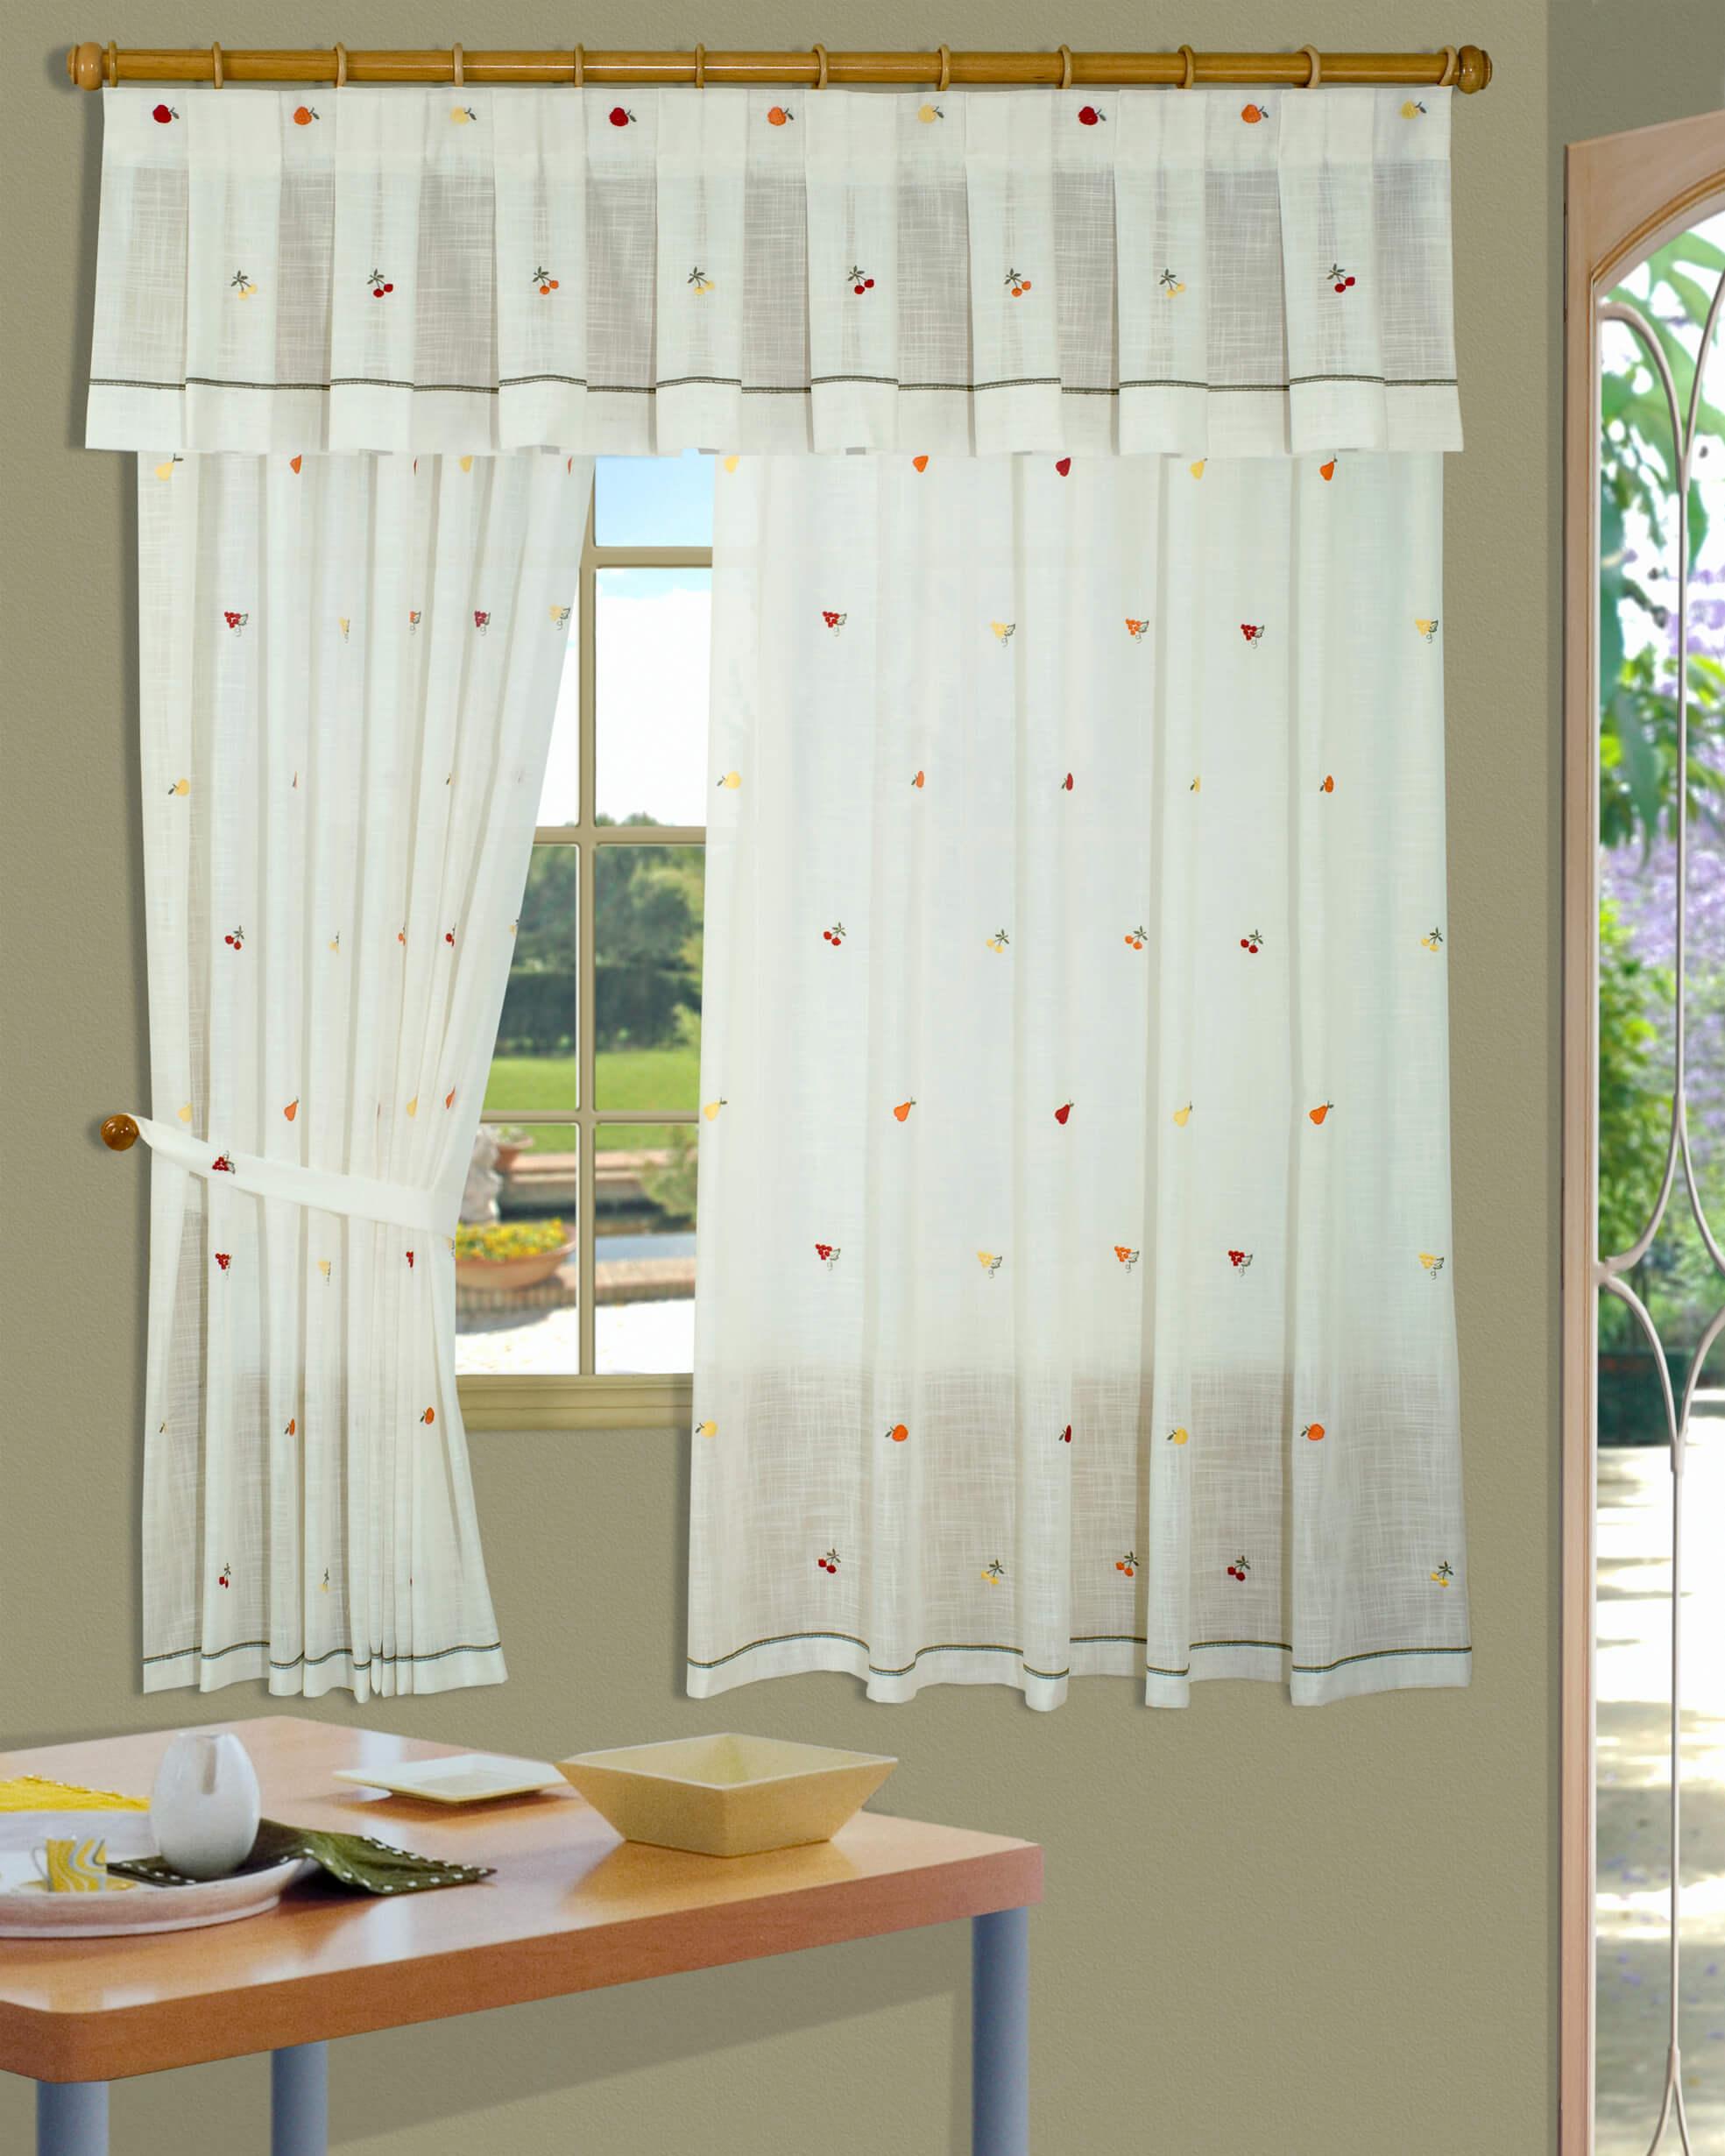 Fotos de cortinas de cocina best simple cool fabulous - Ver cortinas para cocina ...